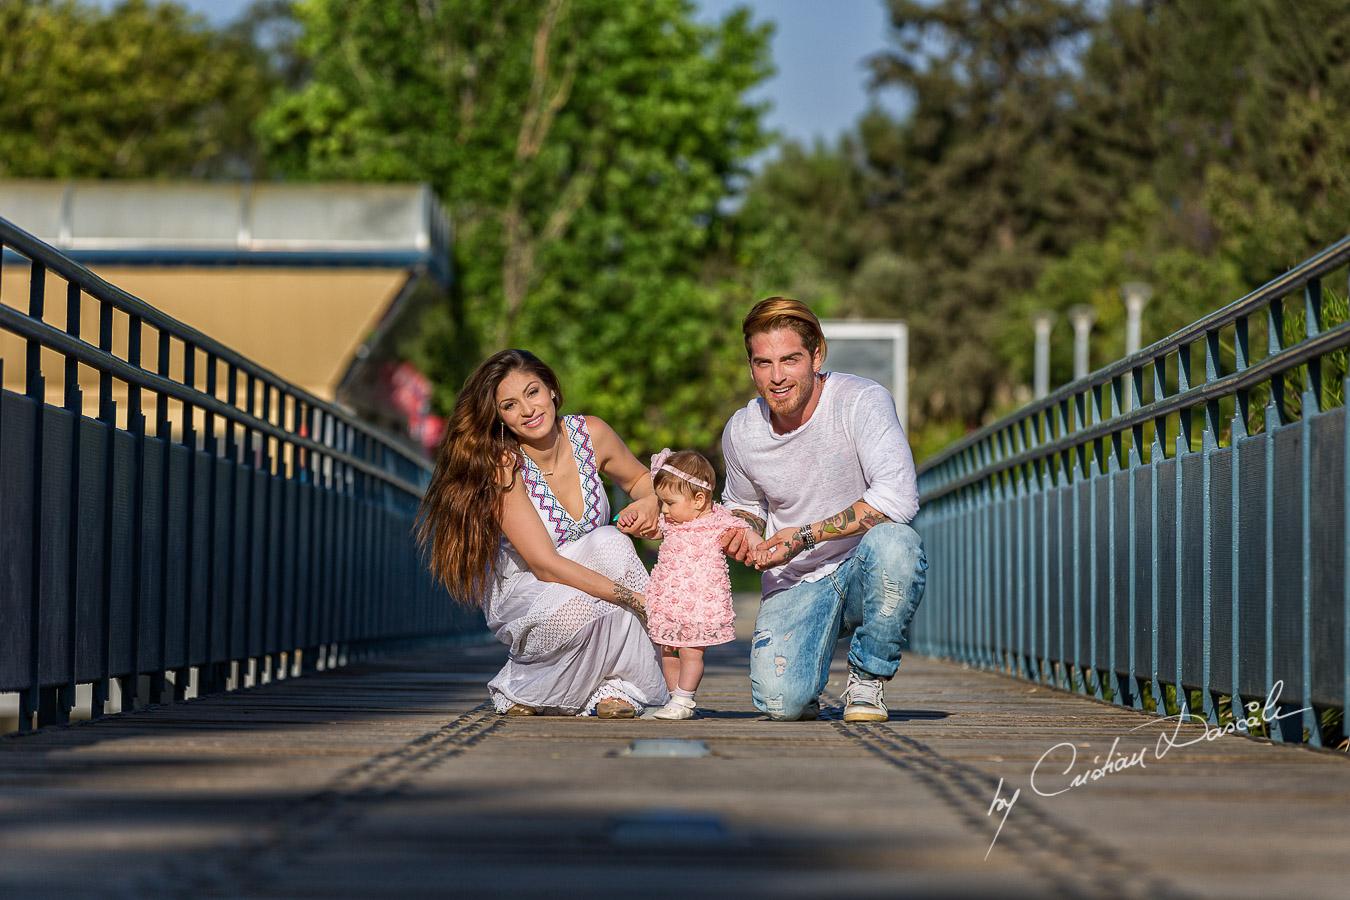 Family Photo Session in Nicosia - 9